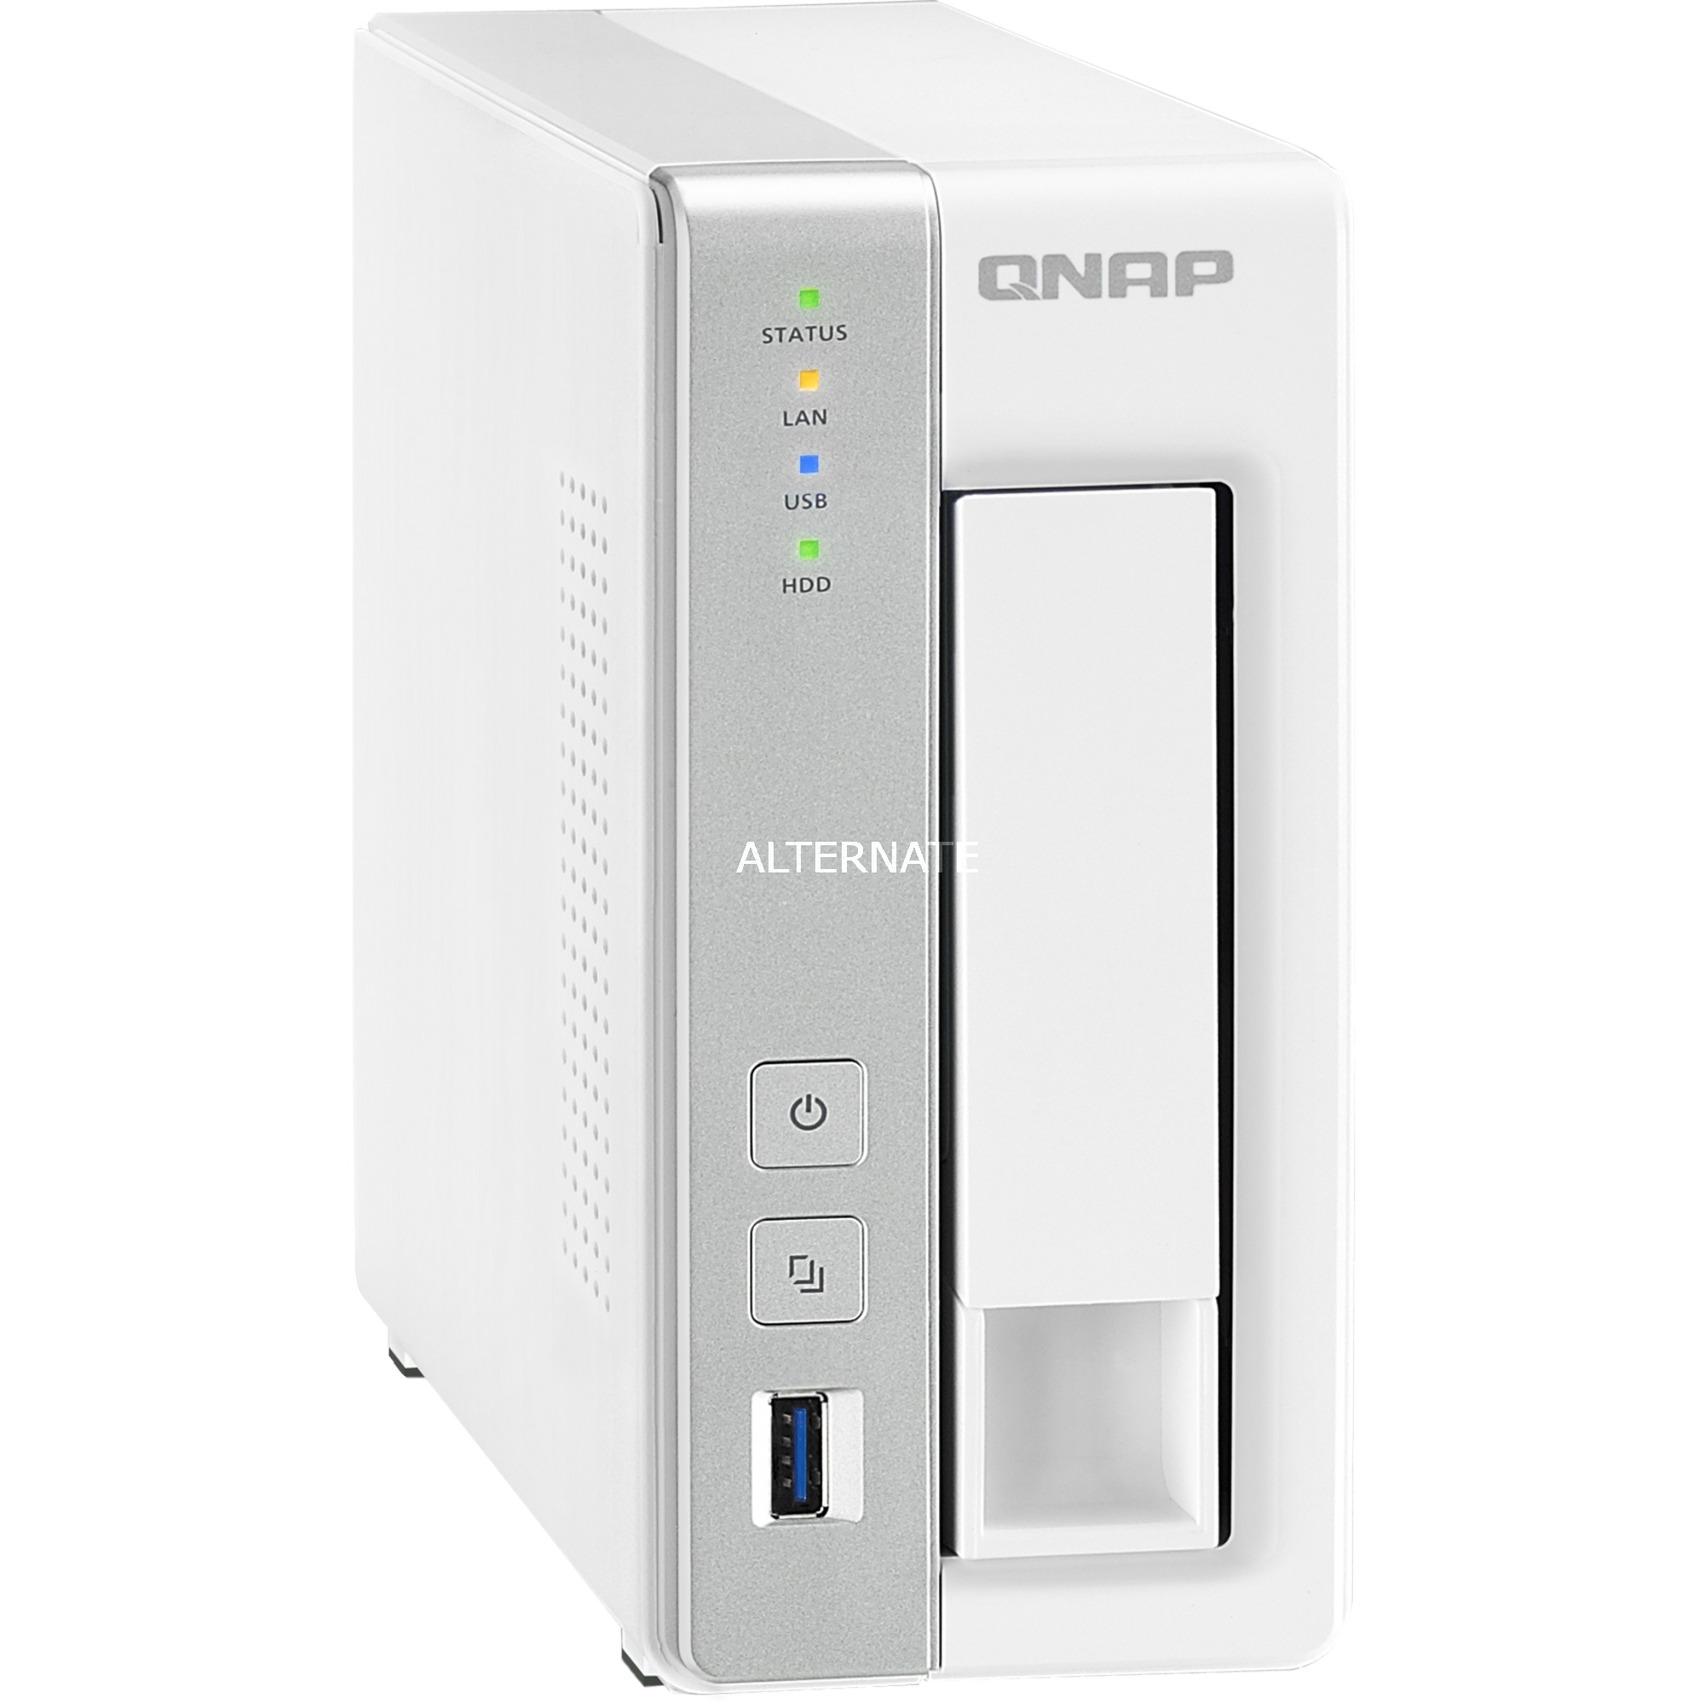 TS-131P NAS Torre Ethernet Gris, Blanco servidor de almacenamiento